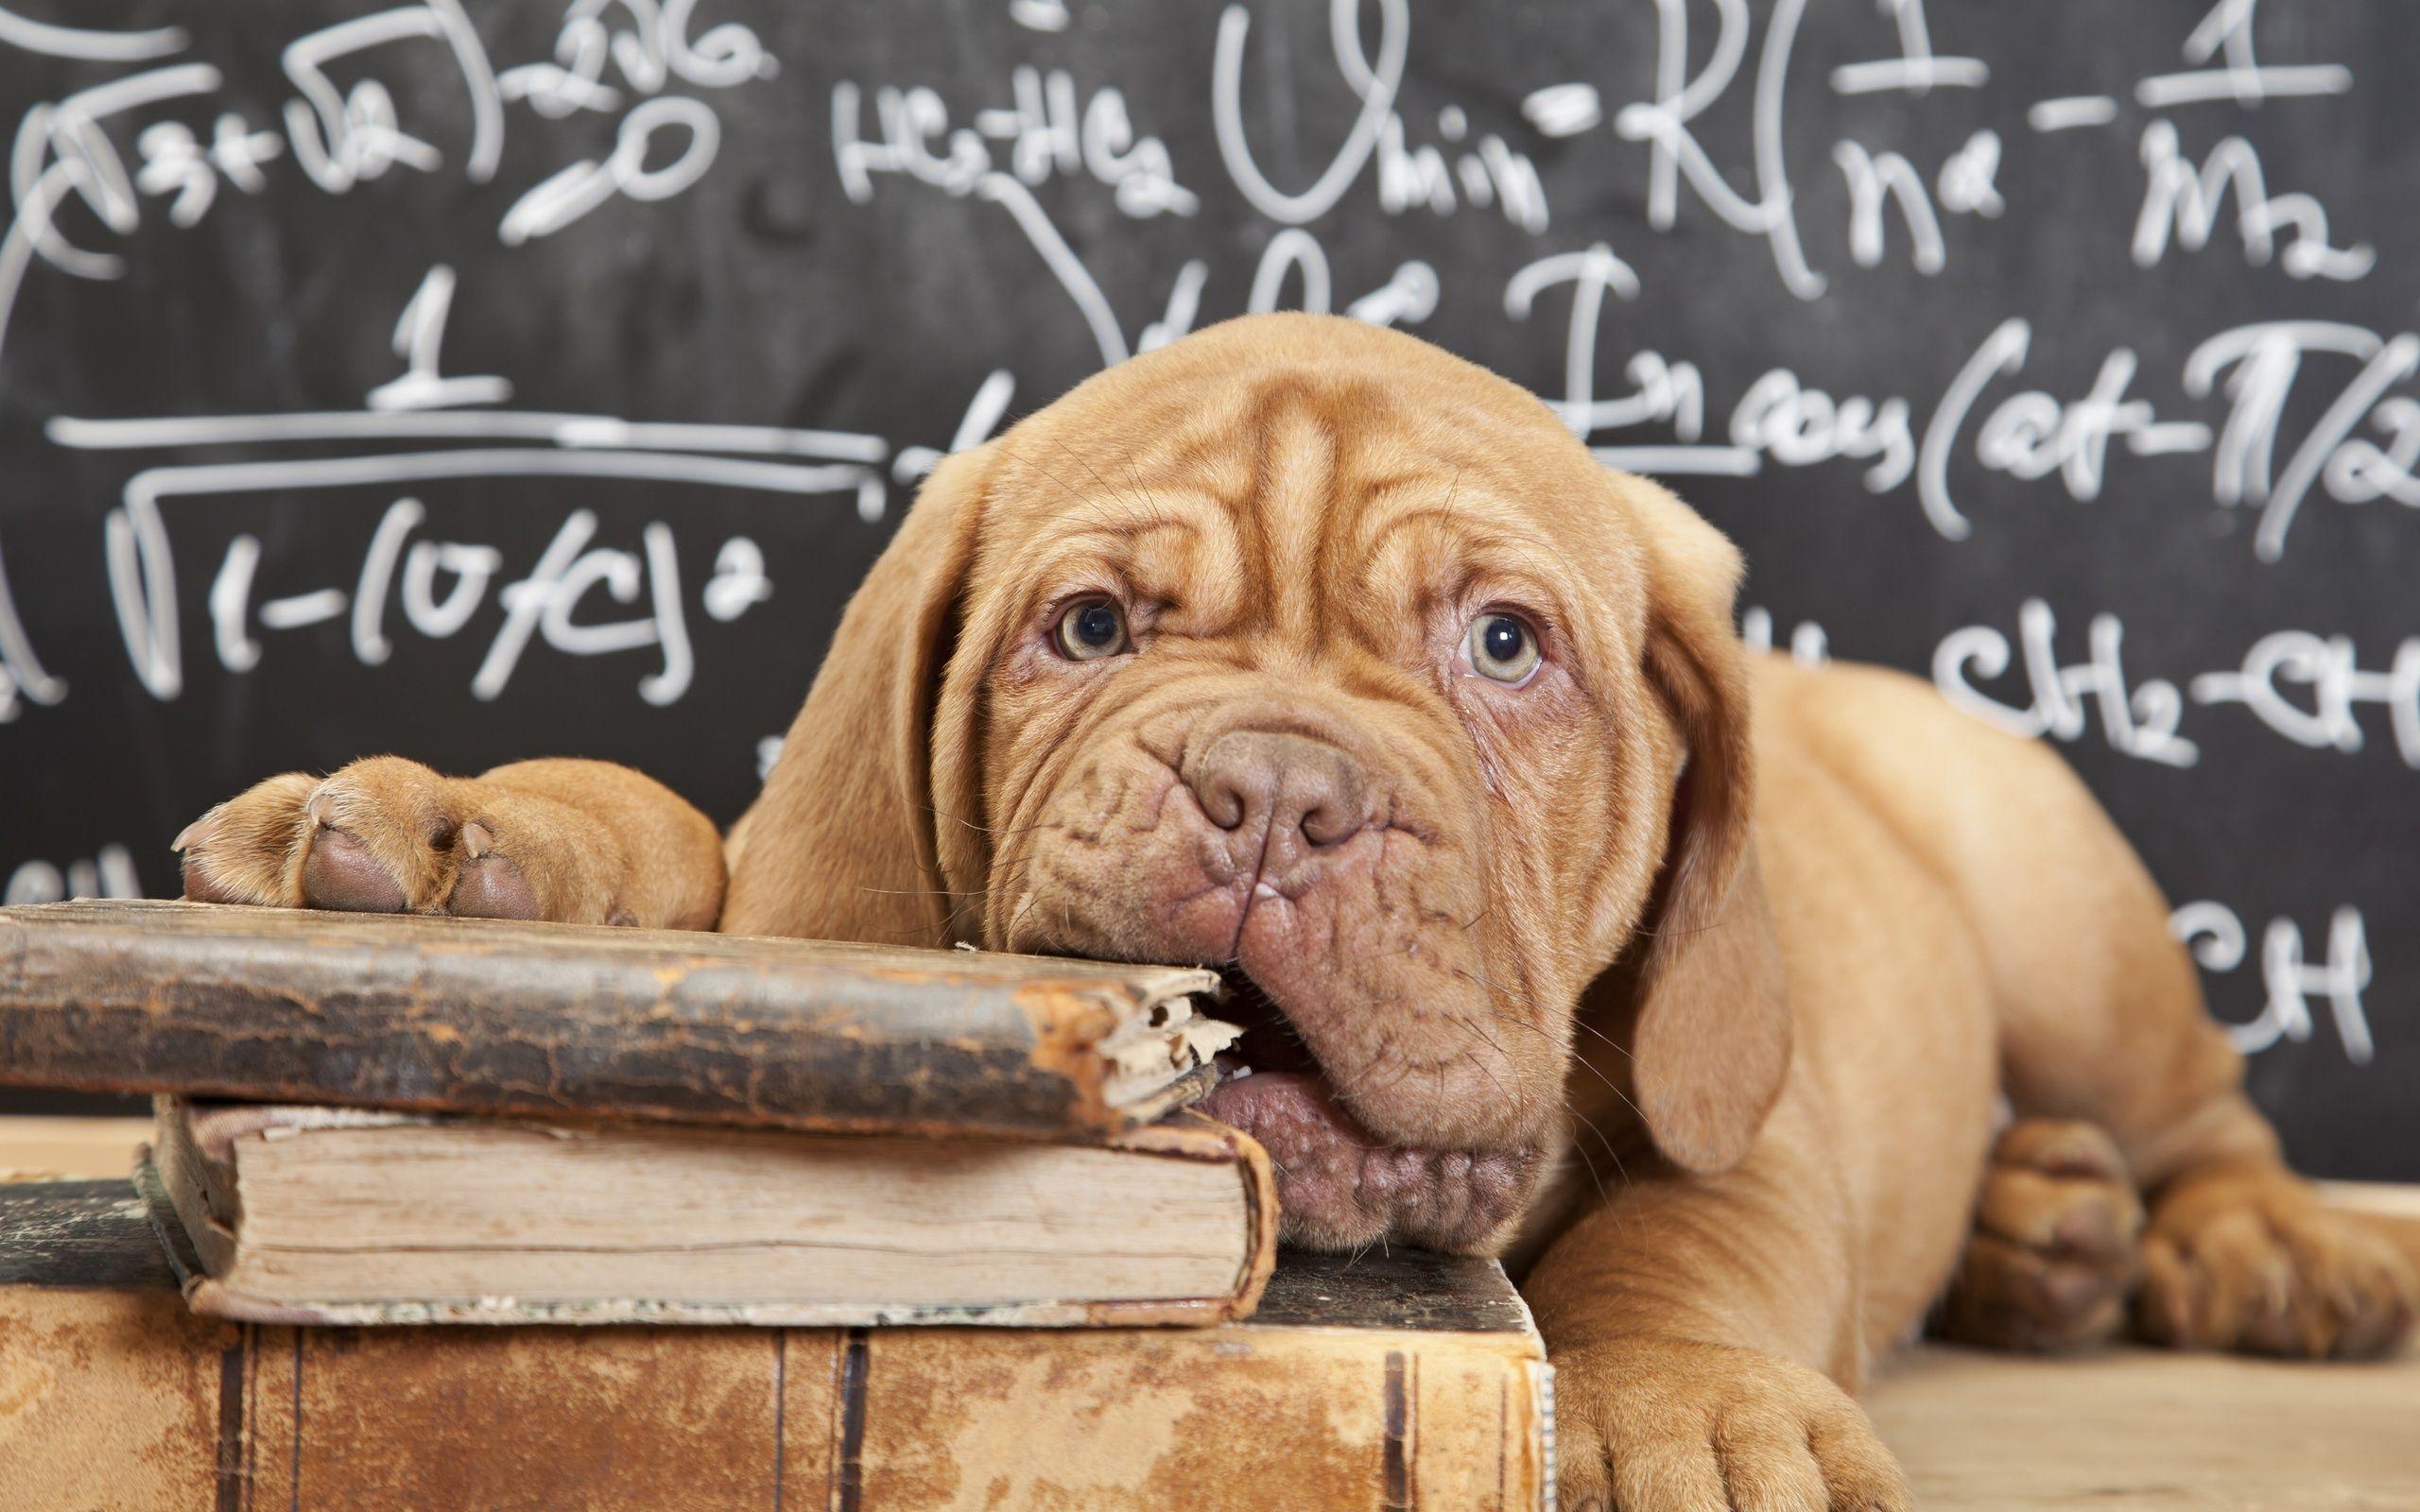 Dogue De Bordoux Puppy At School French Mastiff Dog Books Bordeaux Dog Dogs